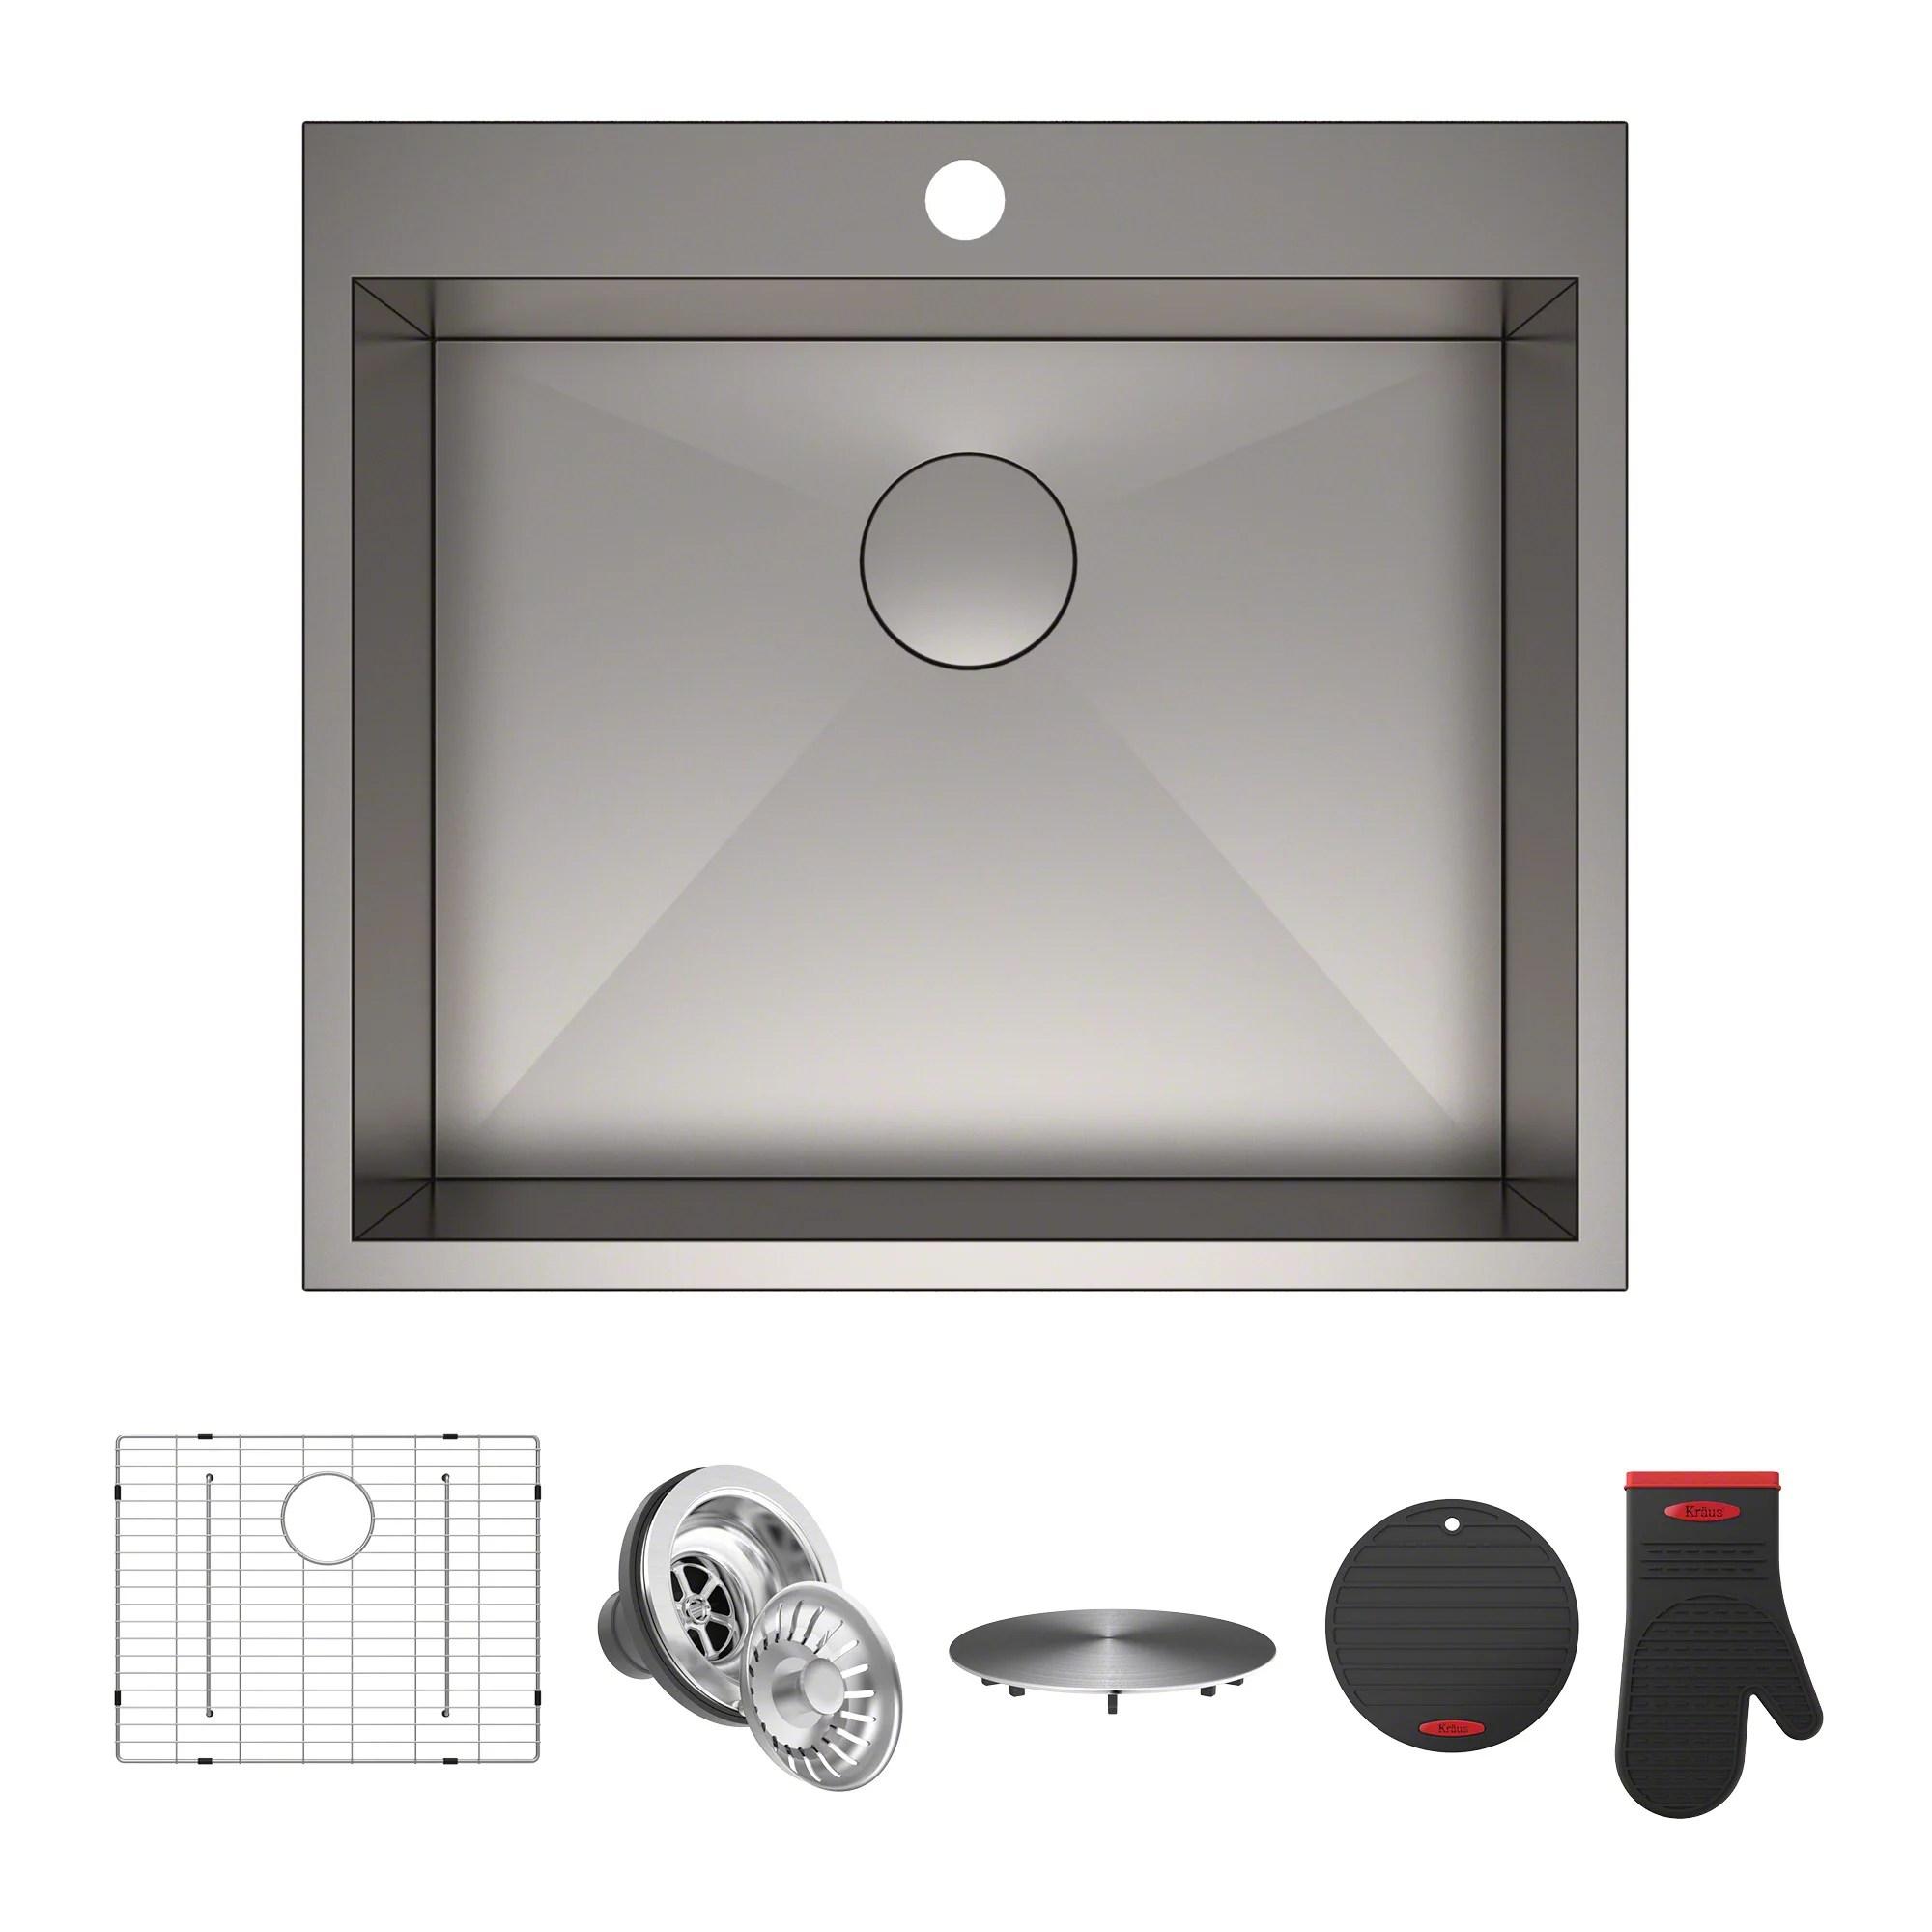 single bowl stainless kitchen sink virtual design kraus pax zero radius 25 steel drop in with 1 pre drilled hole walmart com